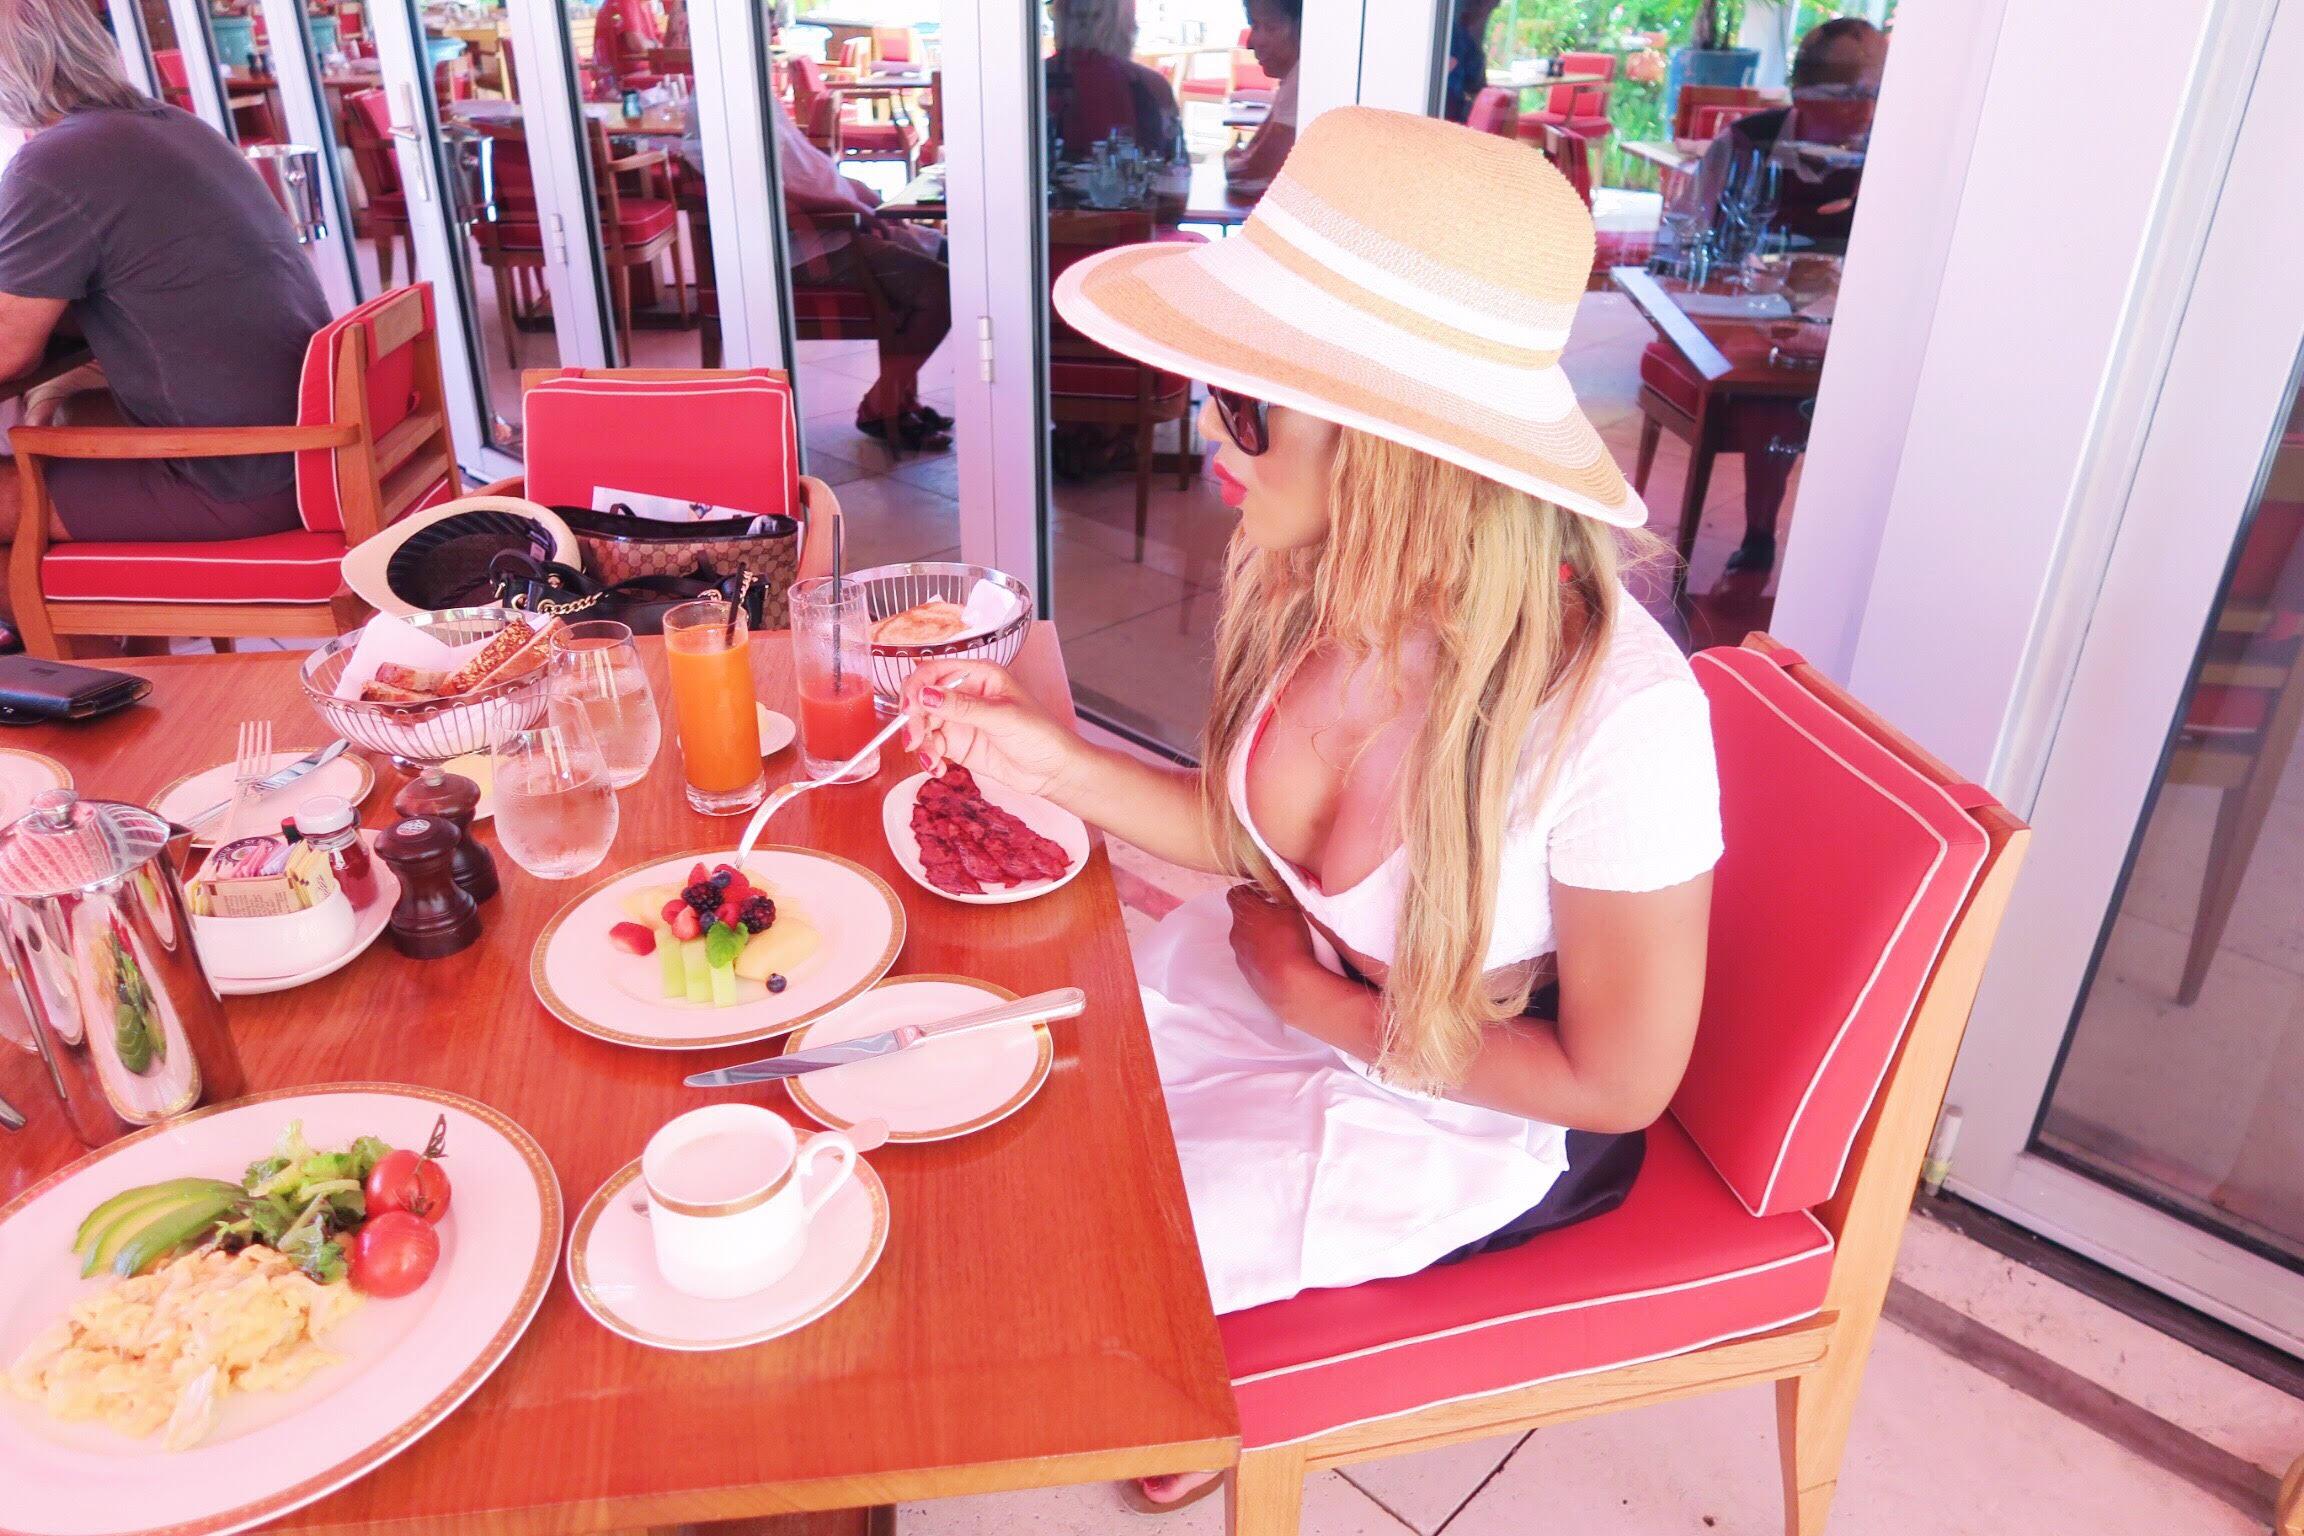 breakfast + faena hotel + miami beach + review + luxury hotel + holiday + stay + 5 star miami hotel + family + gina rio + gerogina rio  + big boobs + hot + beach look + pool side + outfit + bikini + fruit + turkey bacon + food .jpg